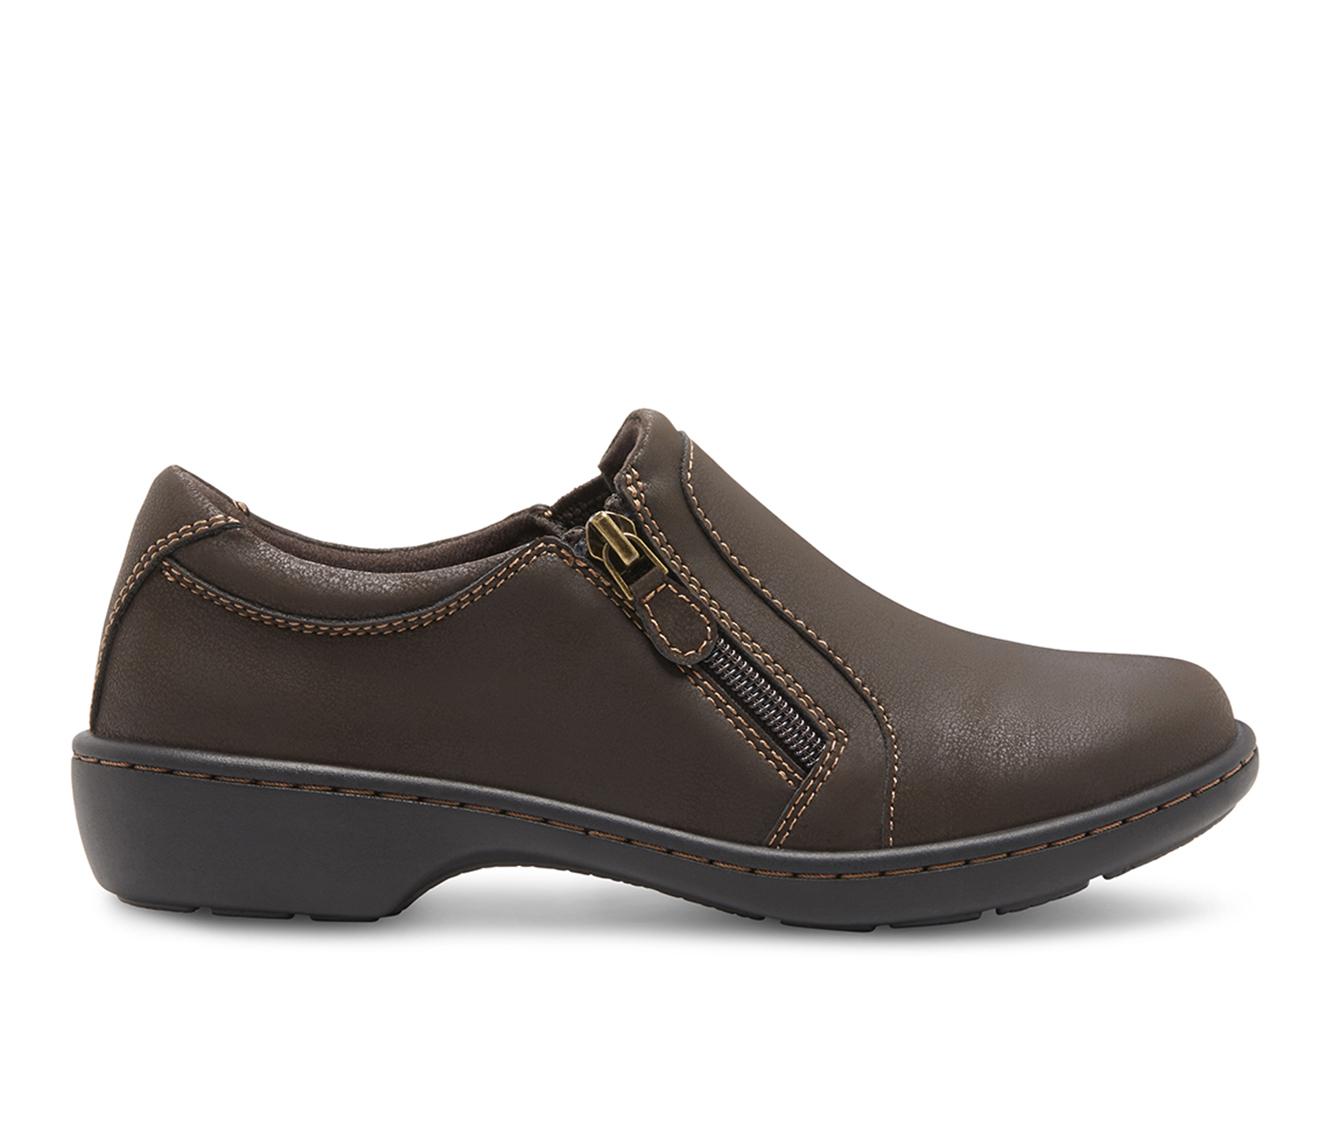 Eastland Vicky Women's Shoe (Brown Faux Leather)